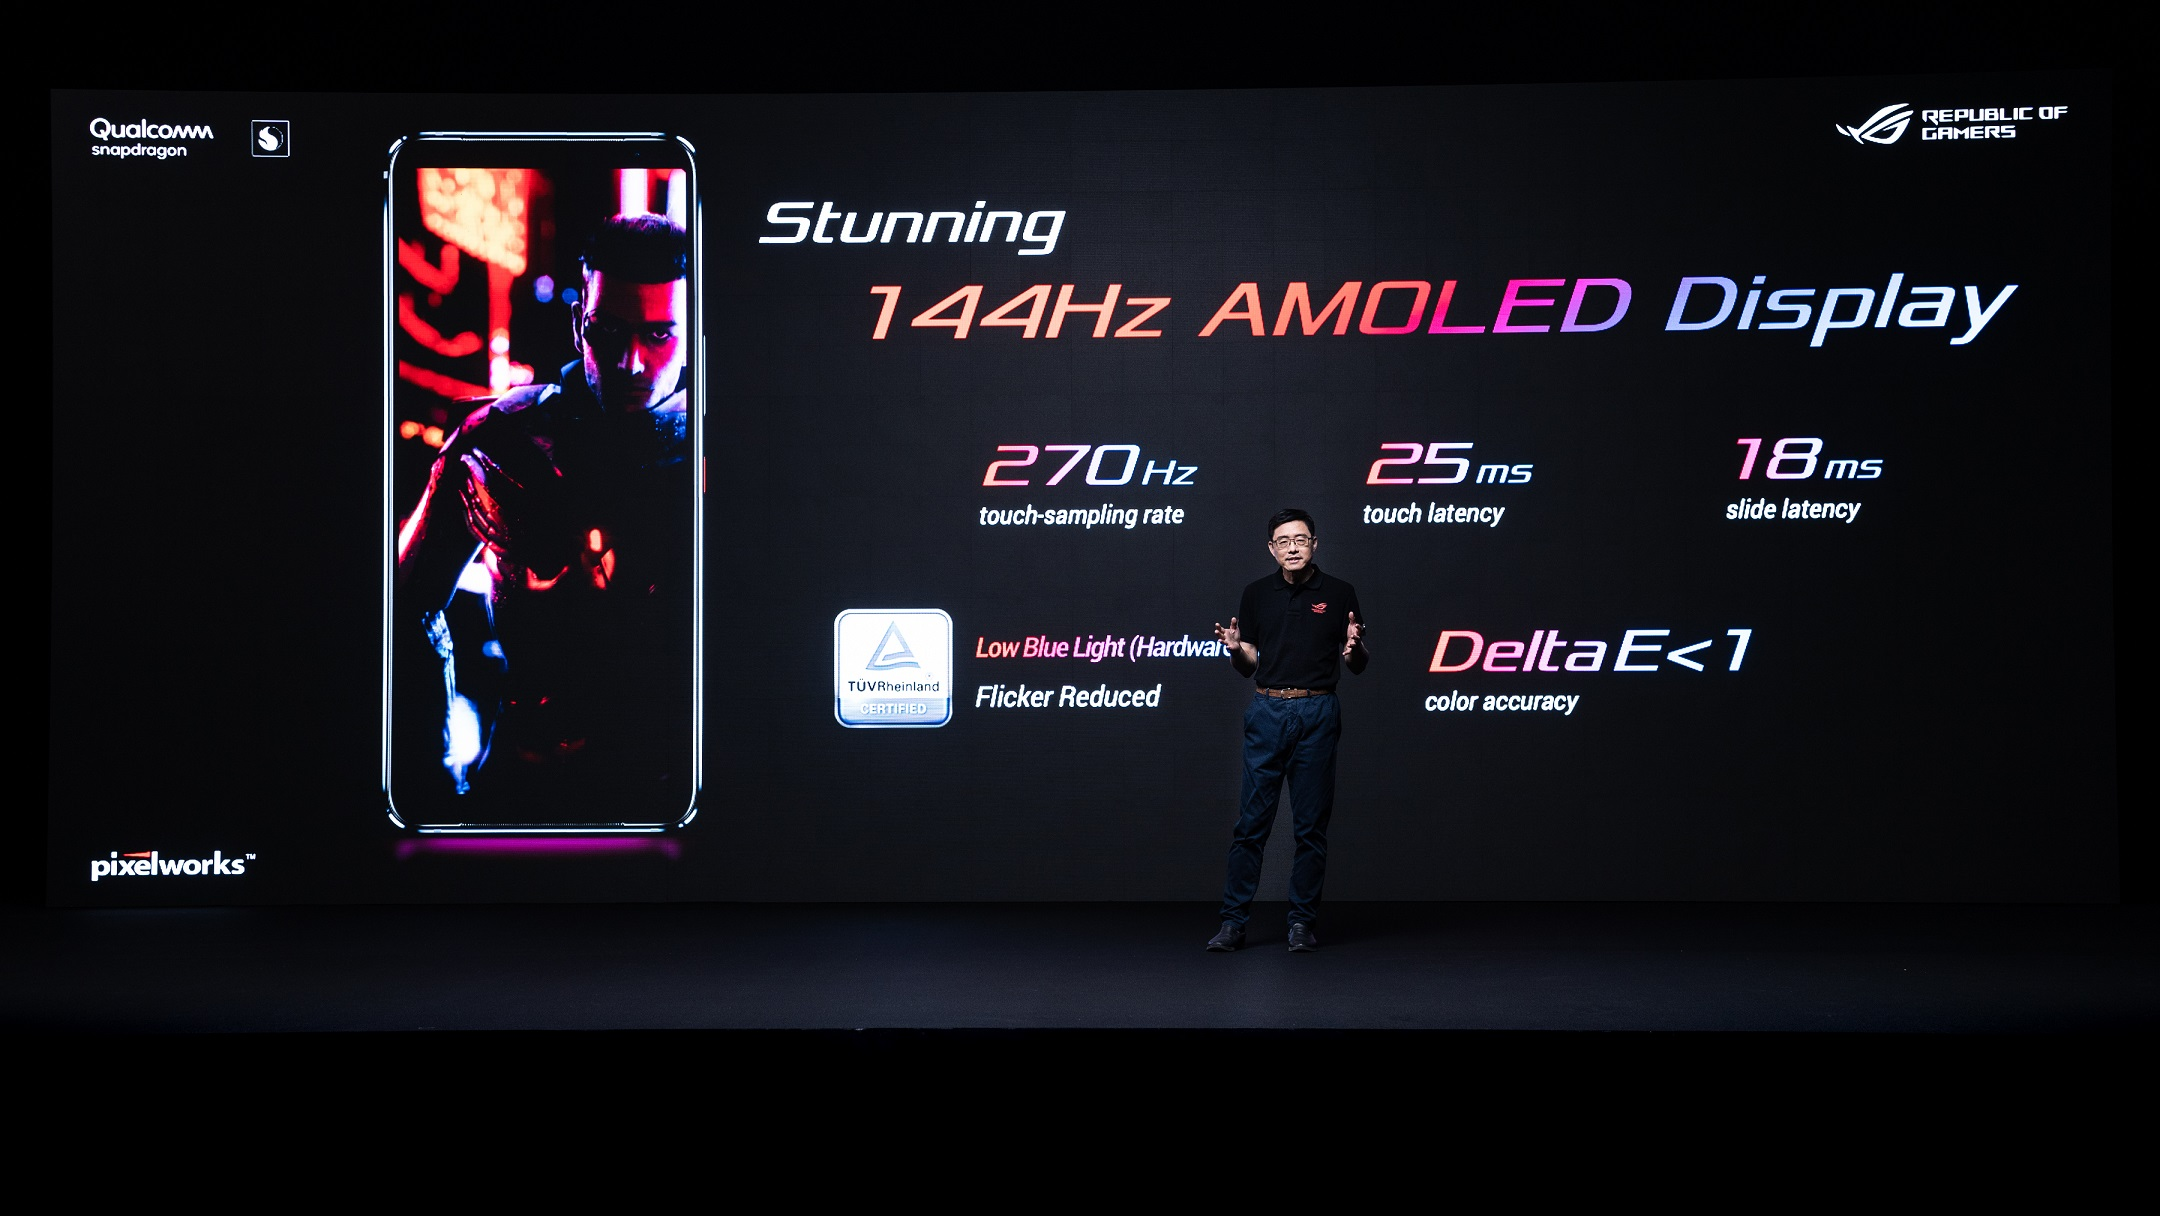 ROG Phone 3具備疾速144Hz更新率、1ms反應時間,除畫面色彩更明亮鮮豔,遊戲中任何酷炫特效和細節刻劃均可近乎真實般躍然眼前。